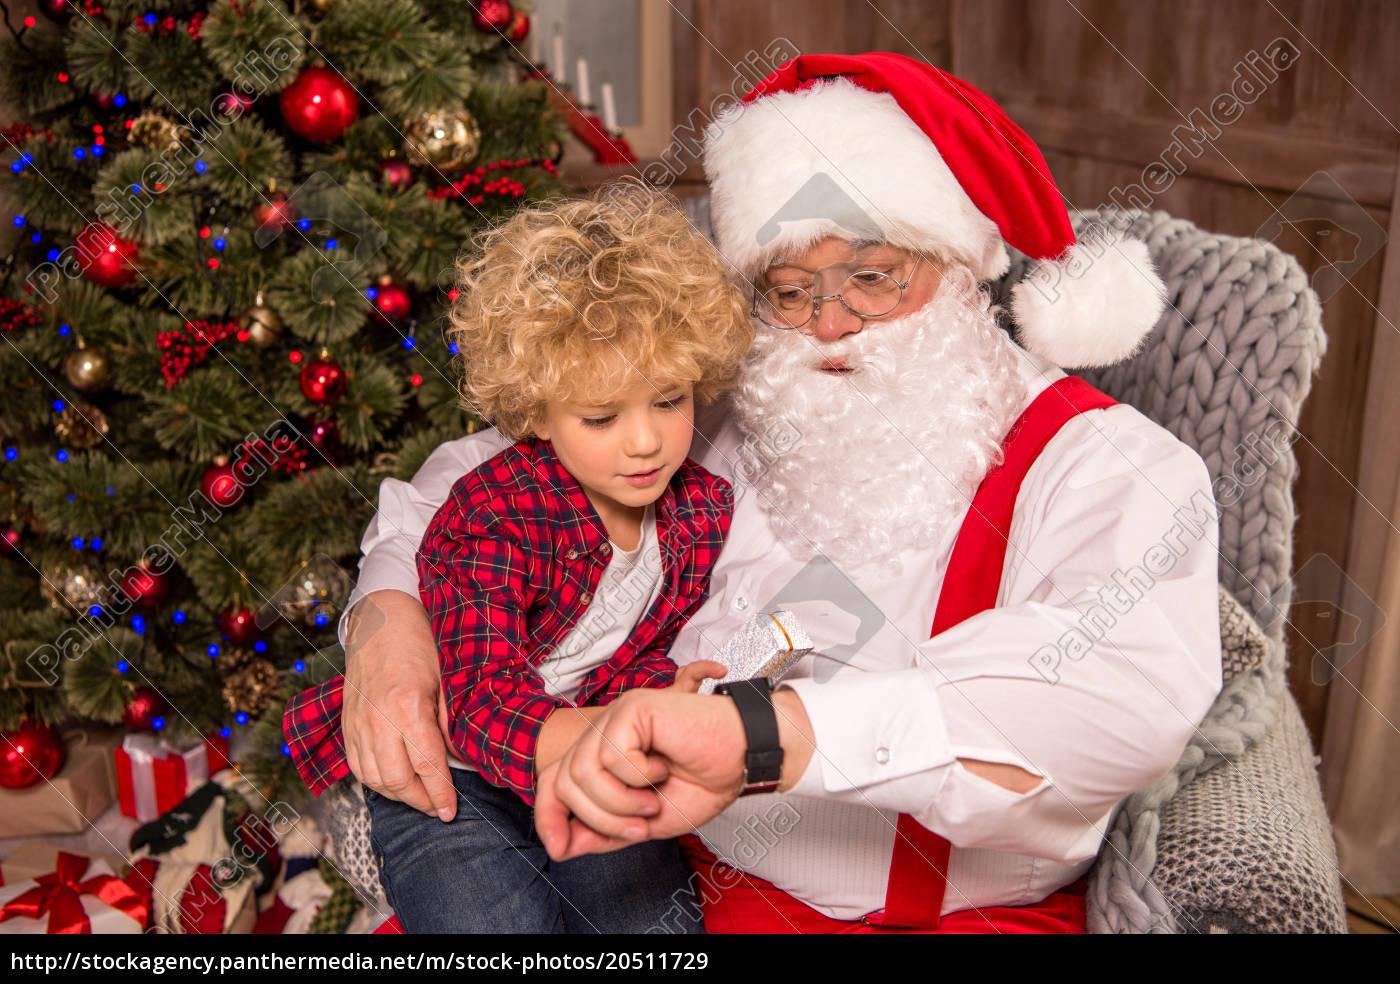 santa, claus, with, kid, on, knee - 20511729